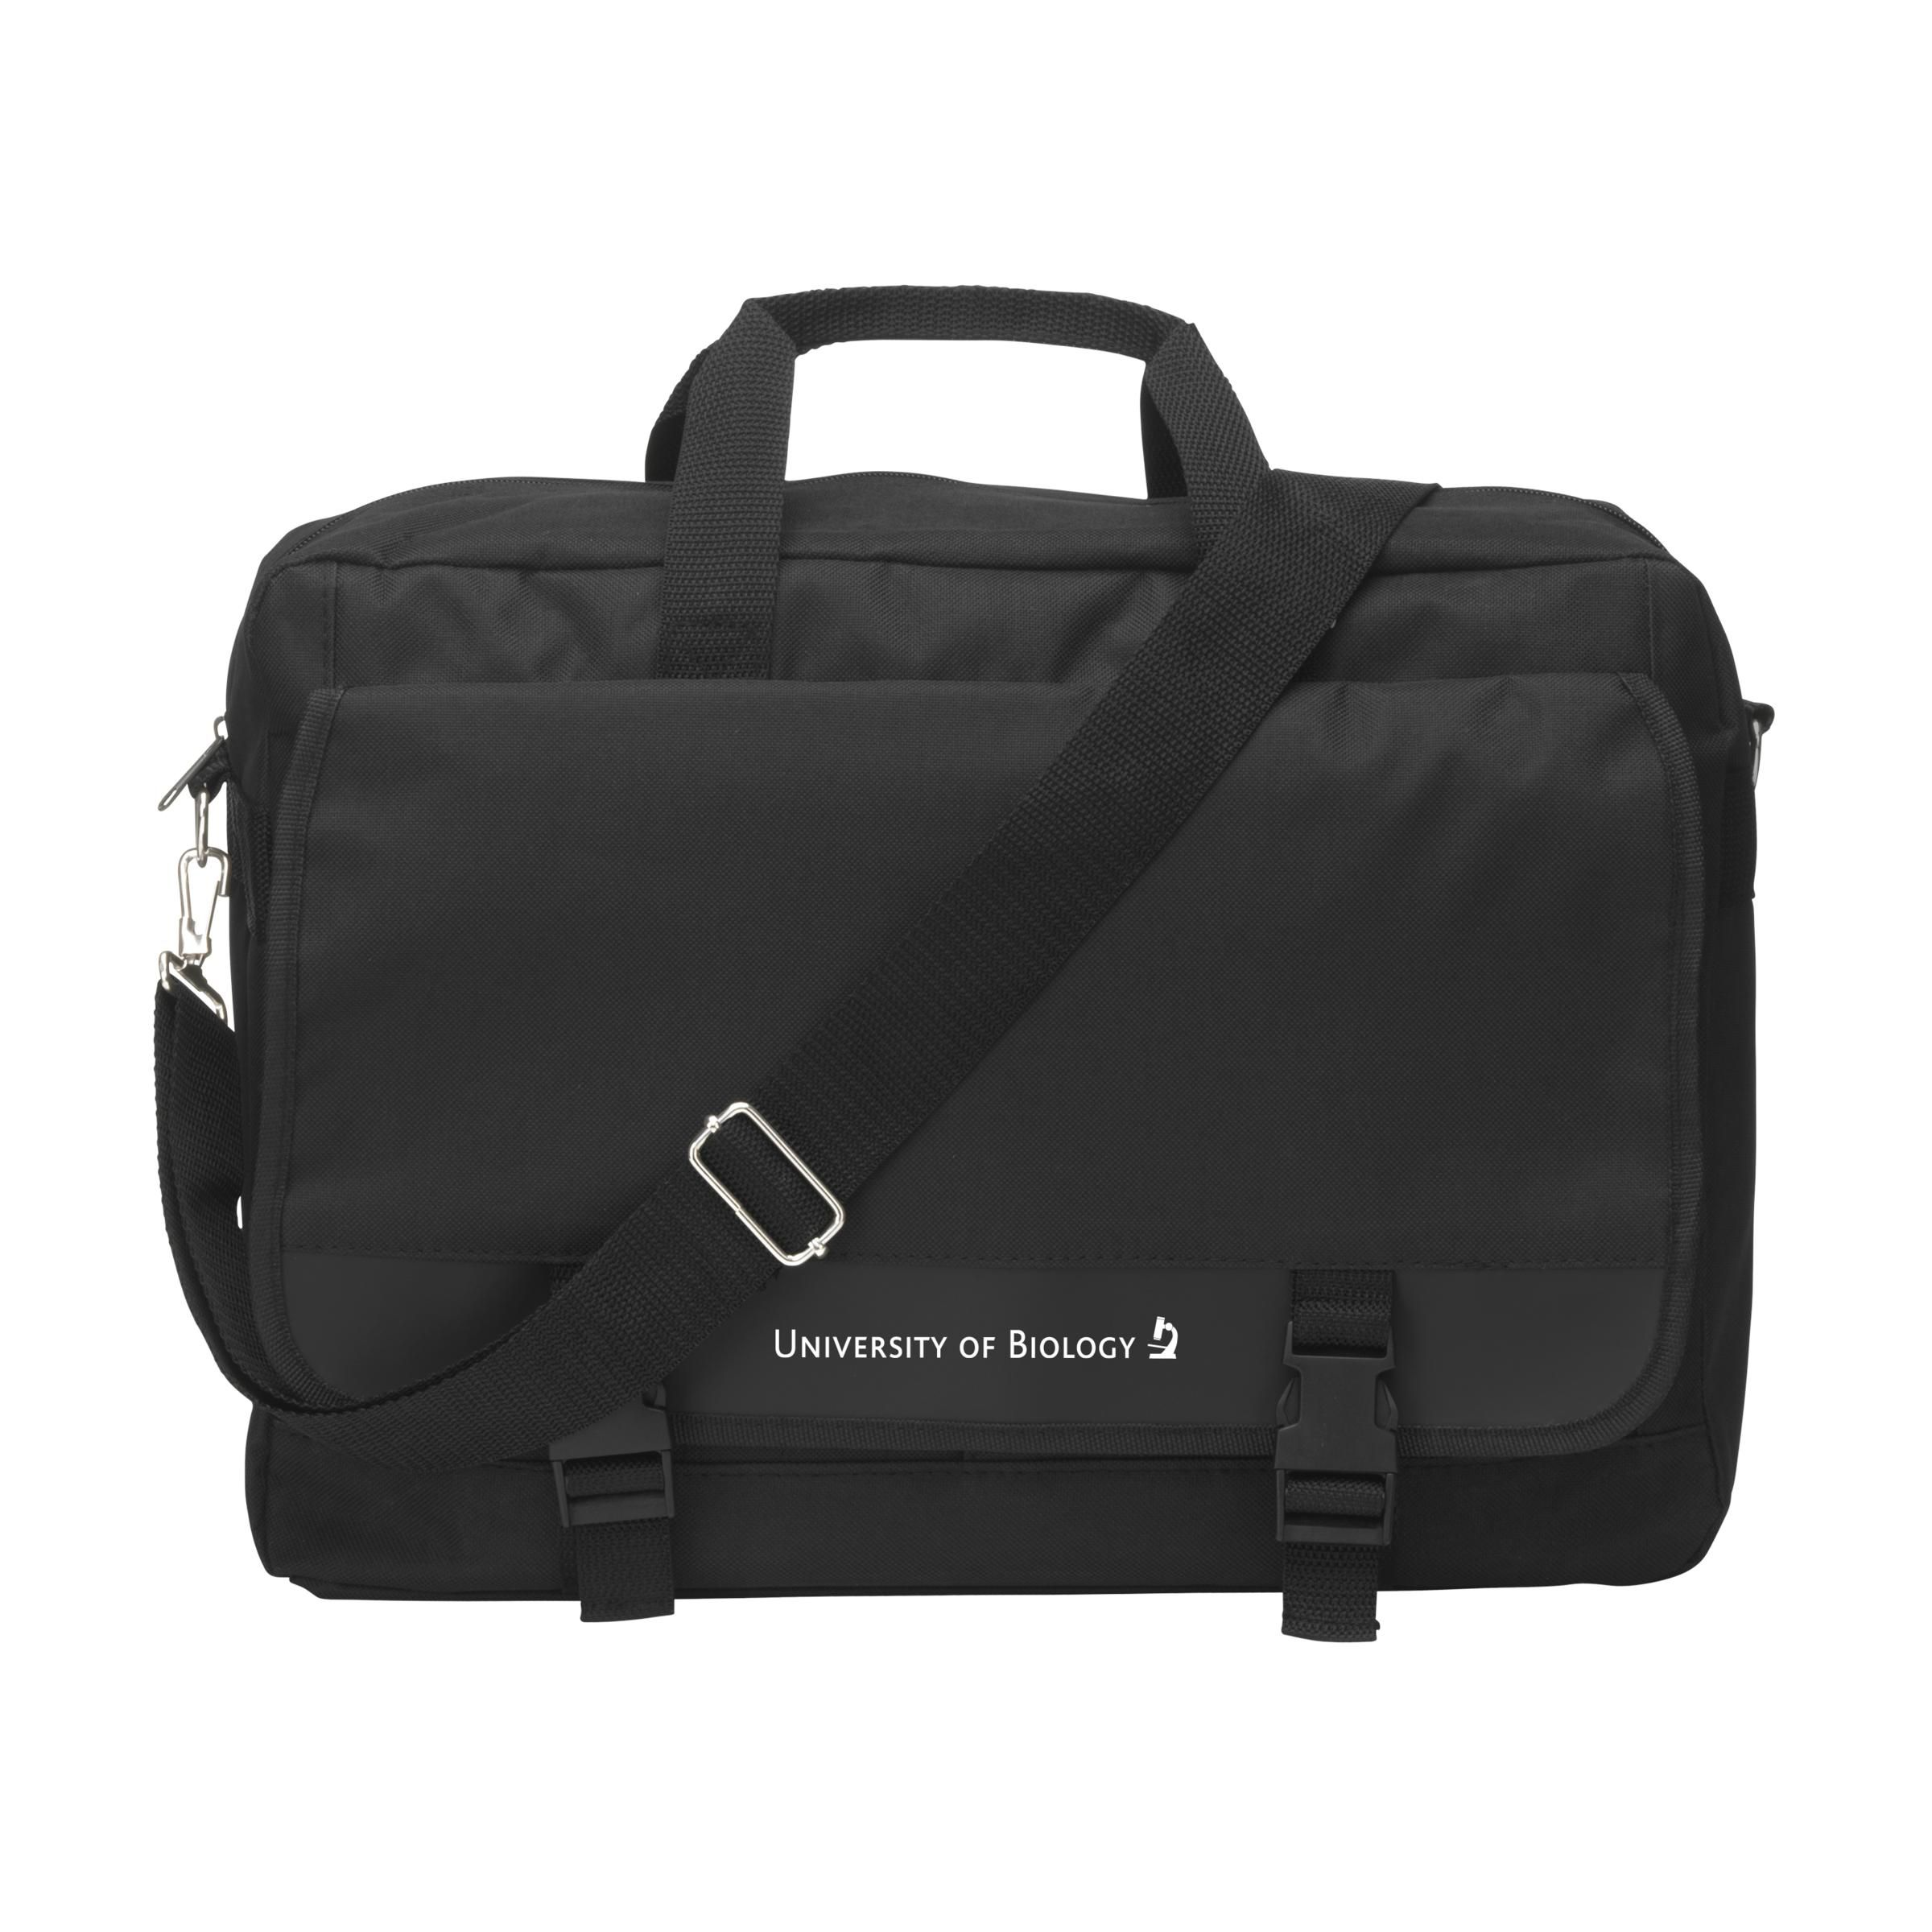 impresión de BusinessPartner document bag